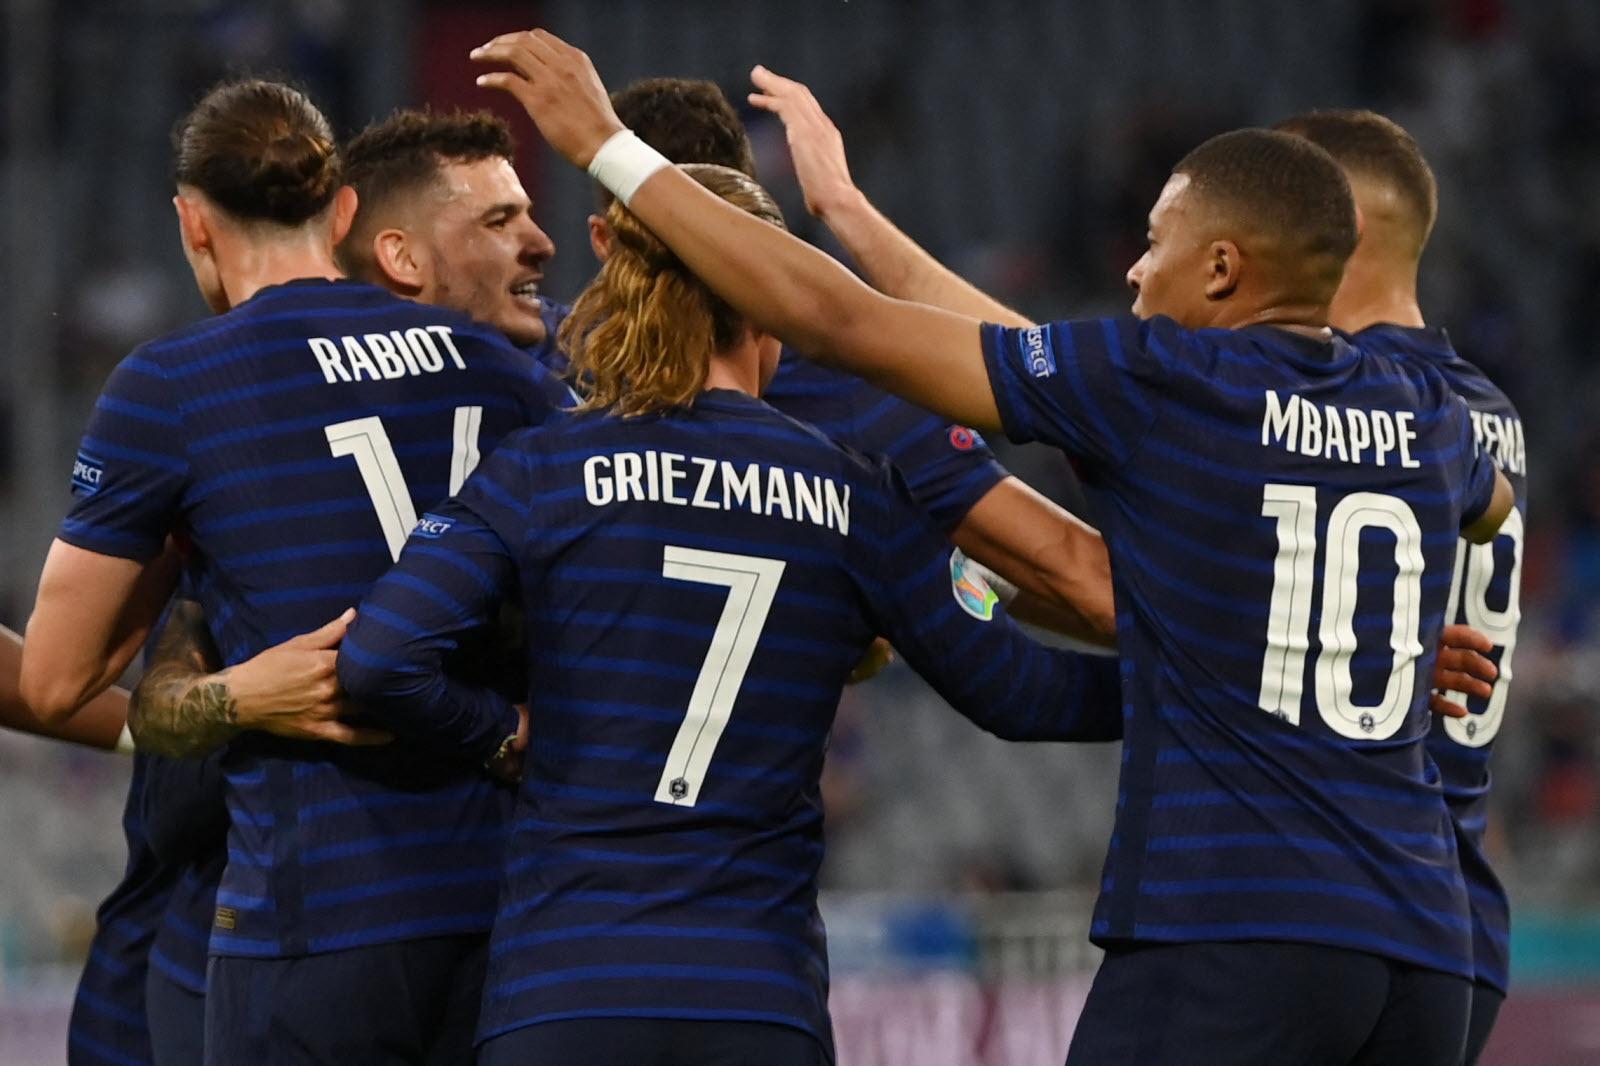 Équipe De France Euro 2021 . Ot6uj51kexbqjm